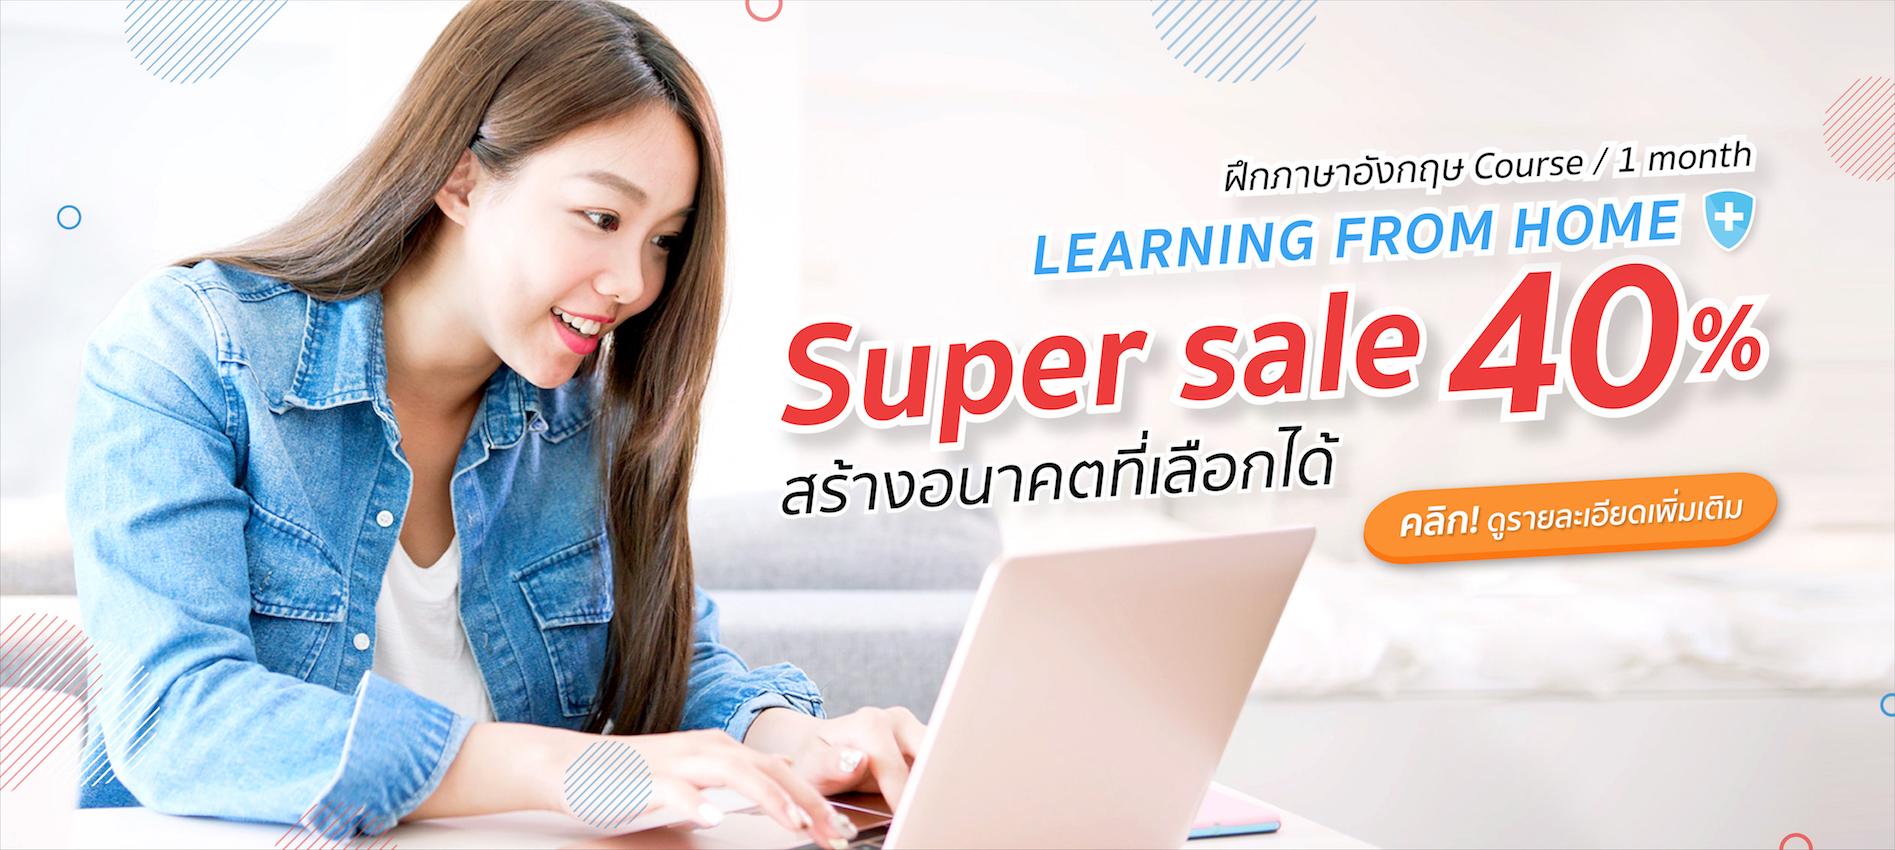 Thailand_size_engoo_banner_3-01